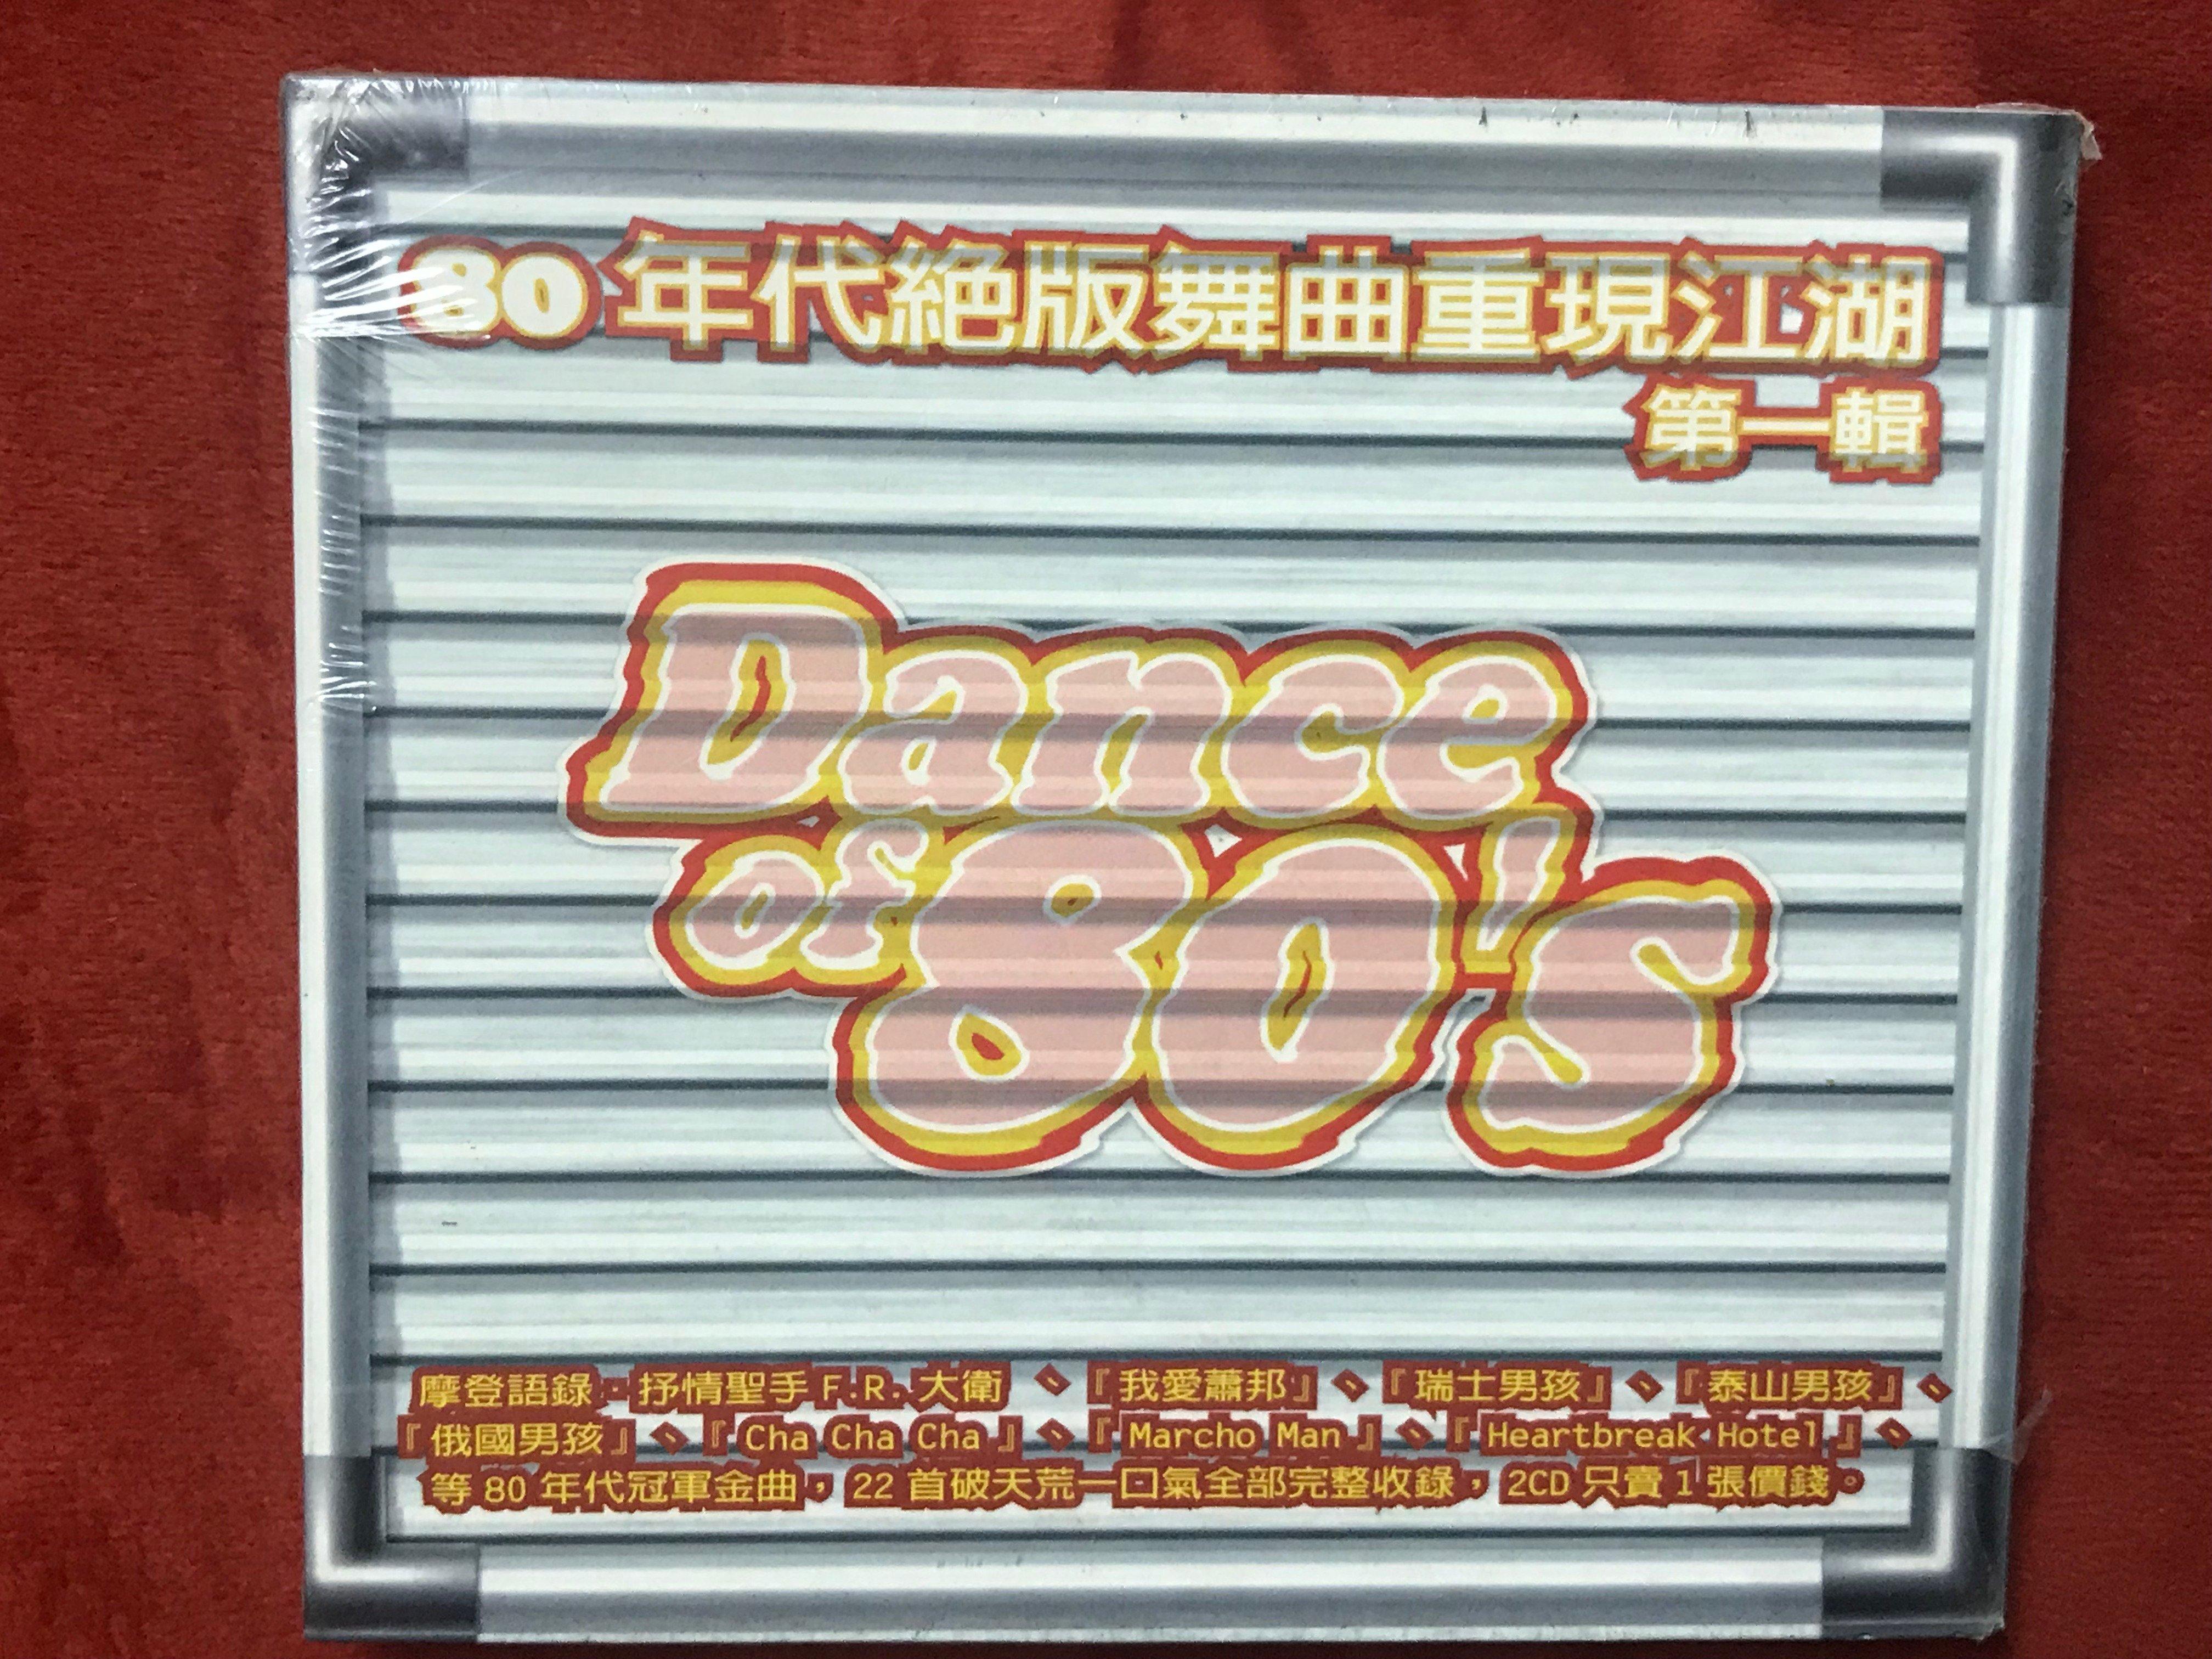 Dance of 80 #x27 s 80年代絕版舞曲重現江湖(雙CD)- 未拆